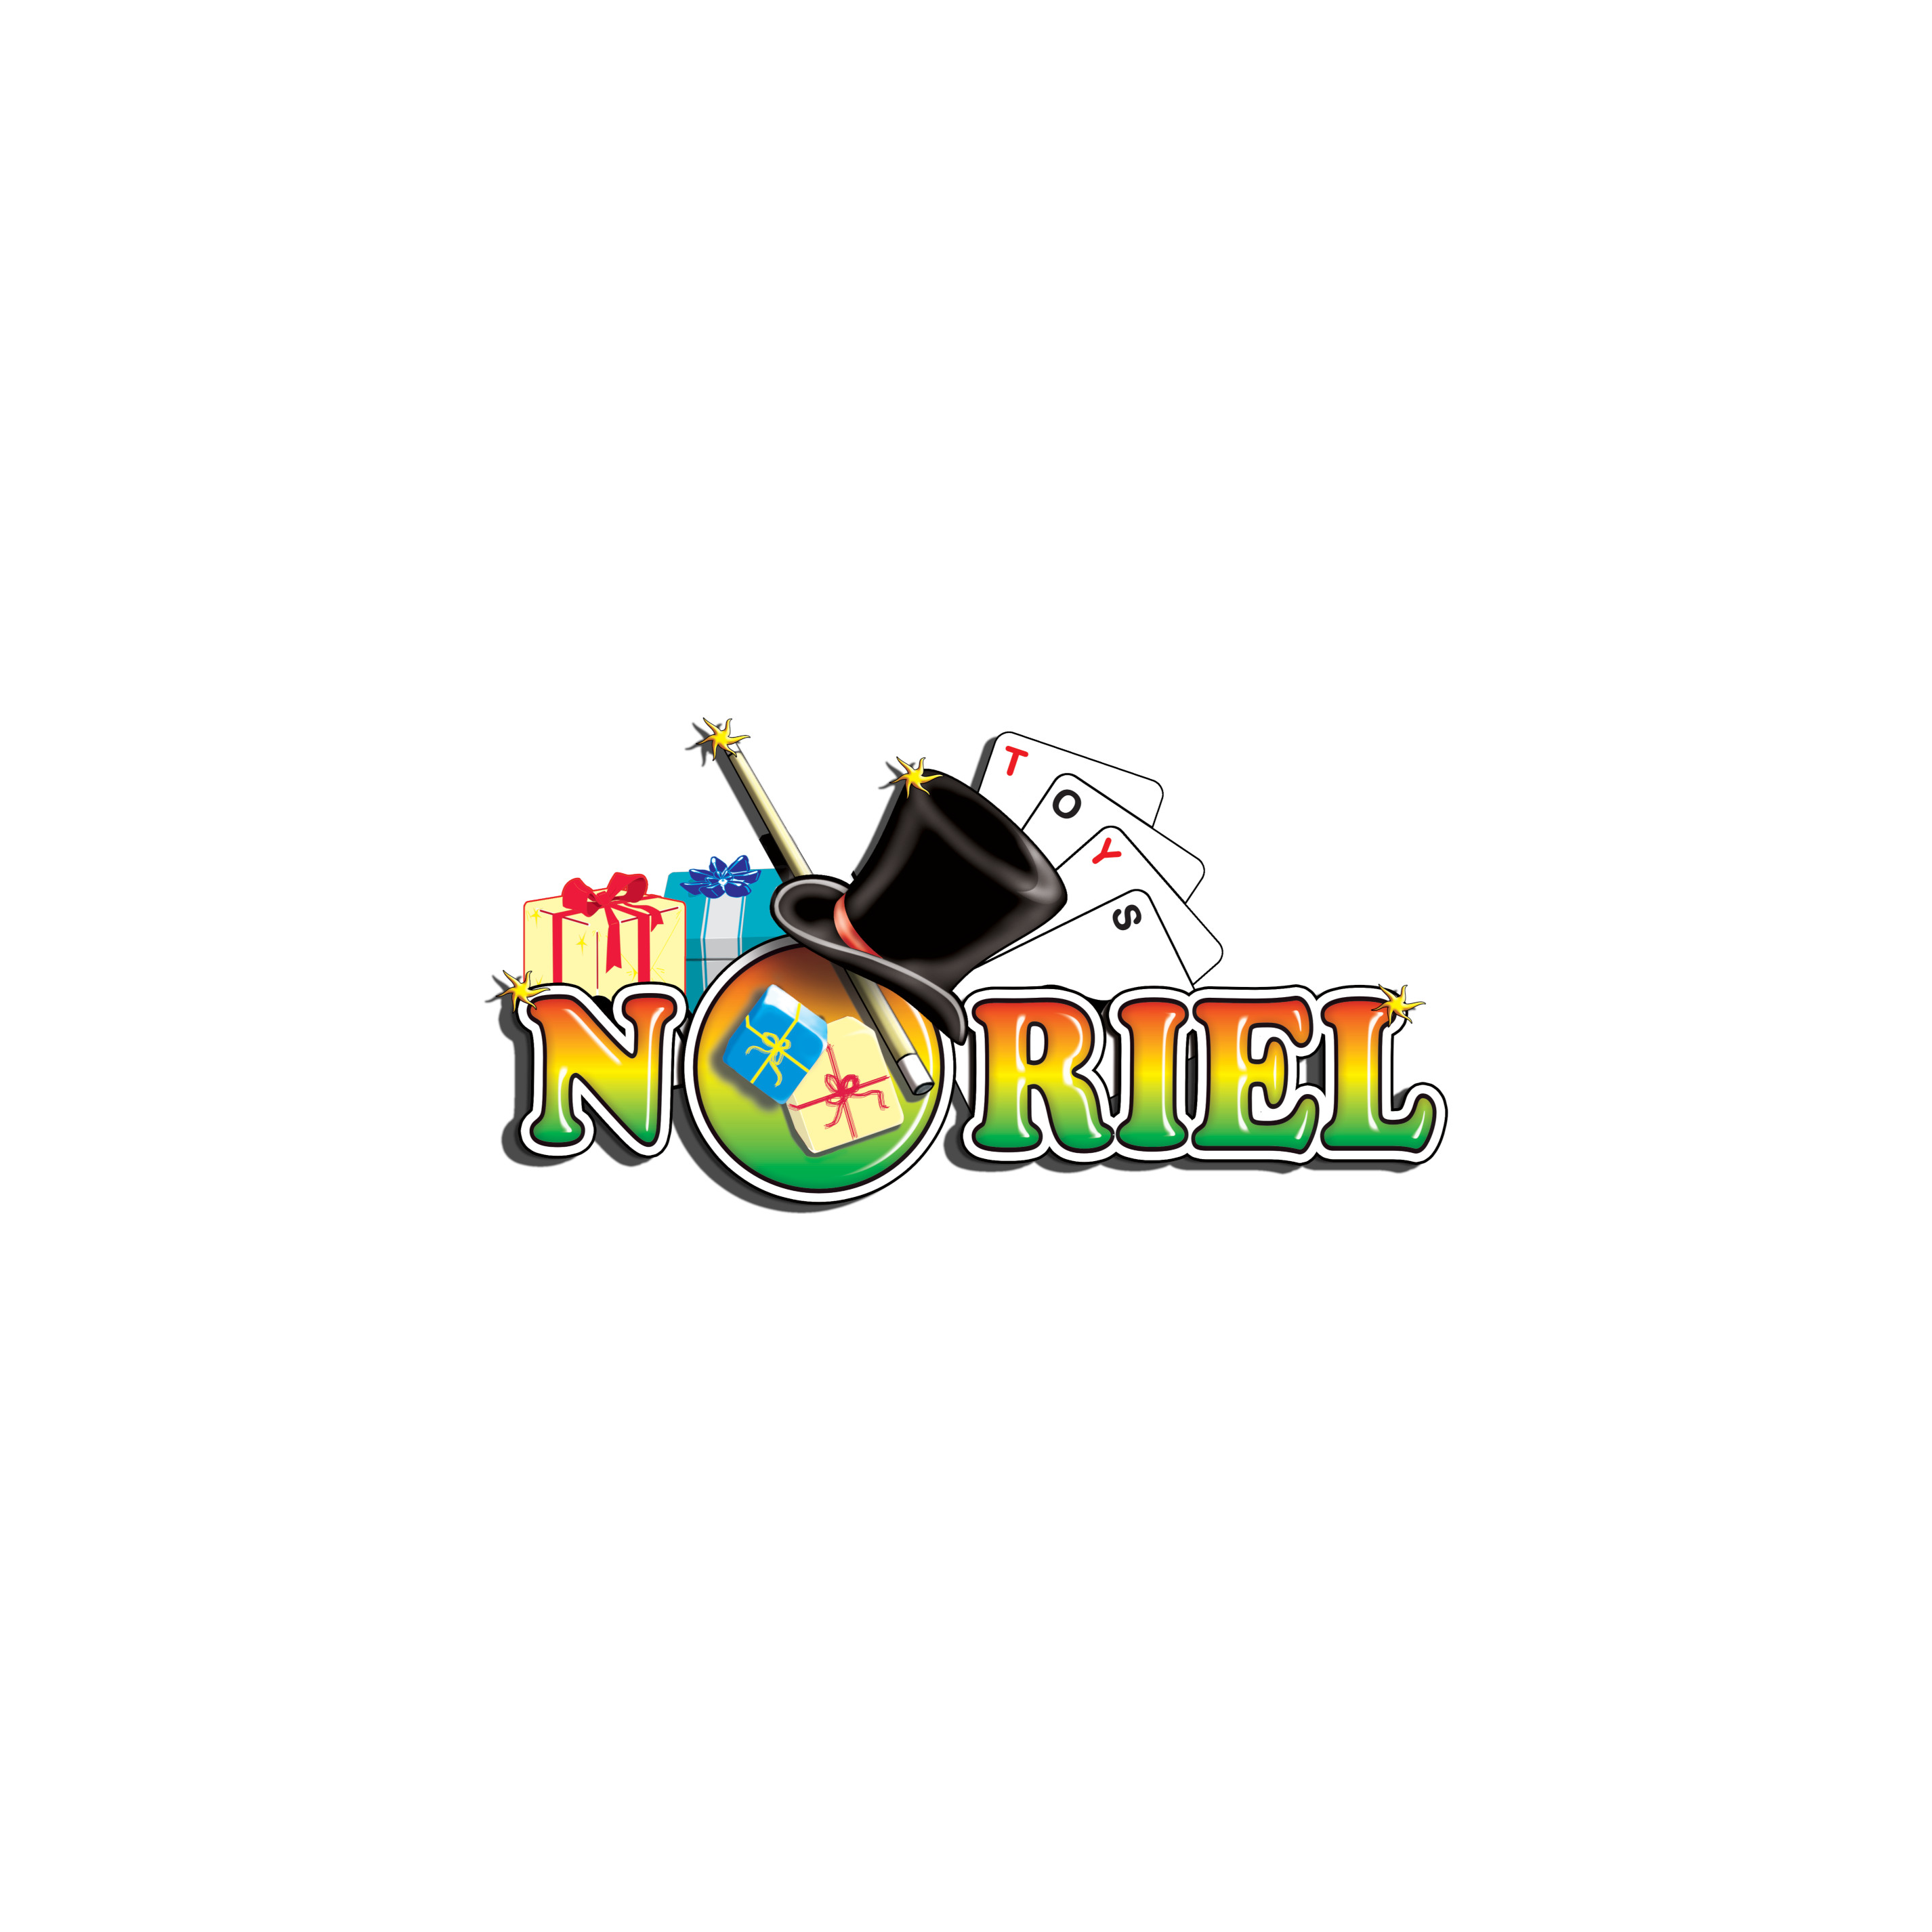 569367E7C Papusa LOL Surprise Boys Arcade Heroes, Storybook Club Bhaddie Bro, Chaos